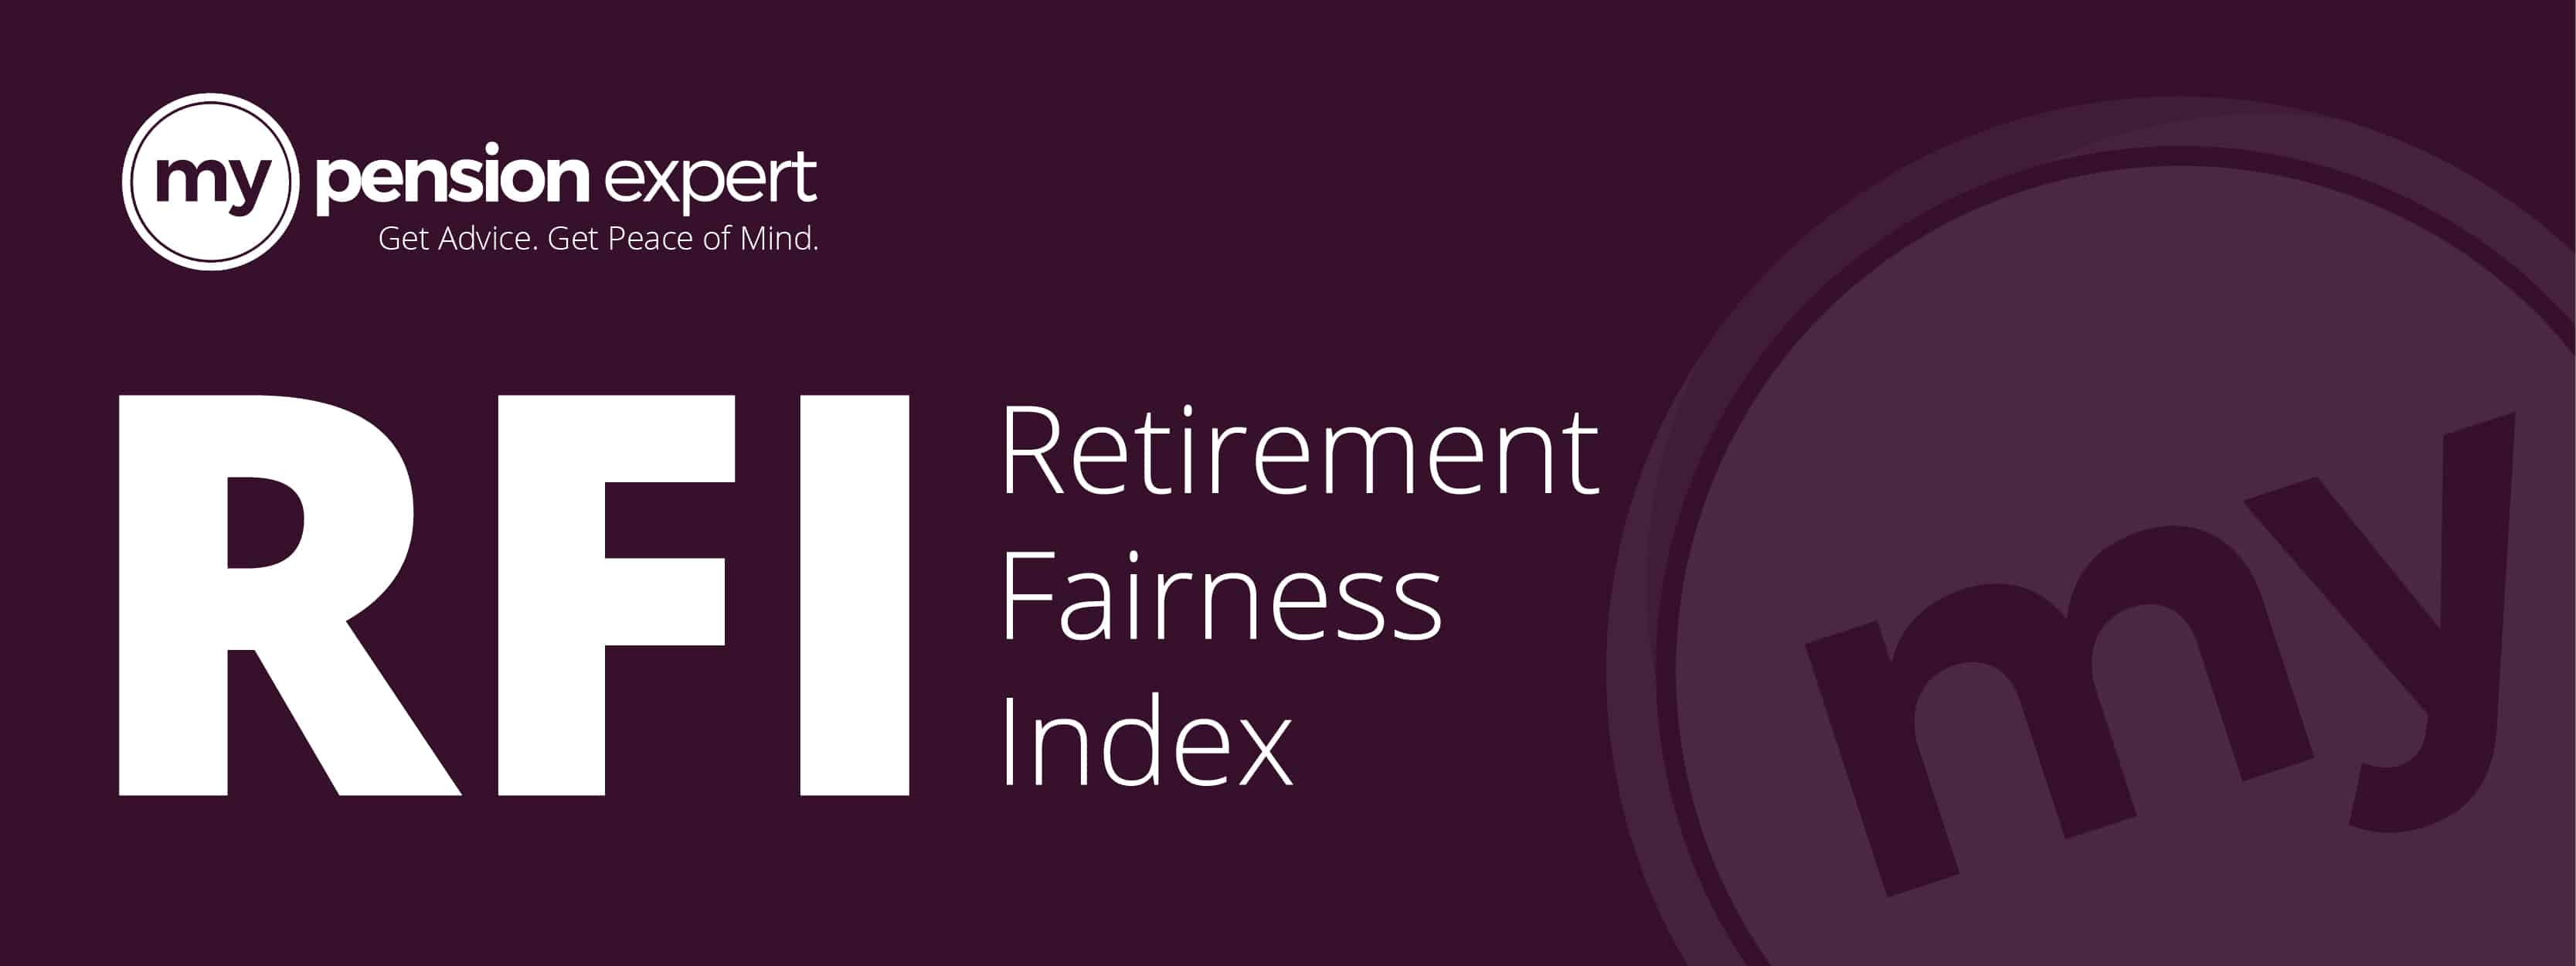 Retirement Fairness Index Banner